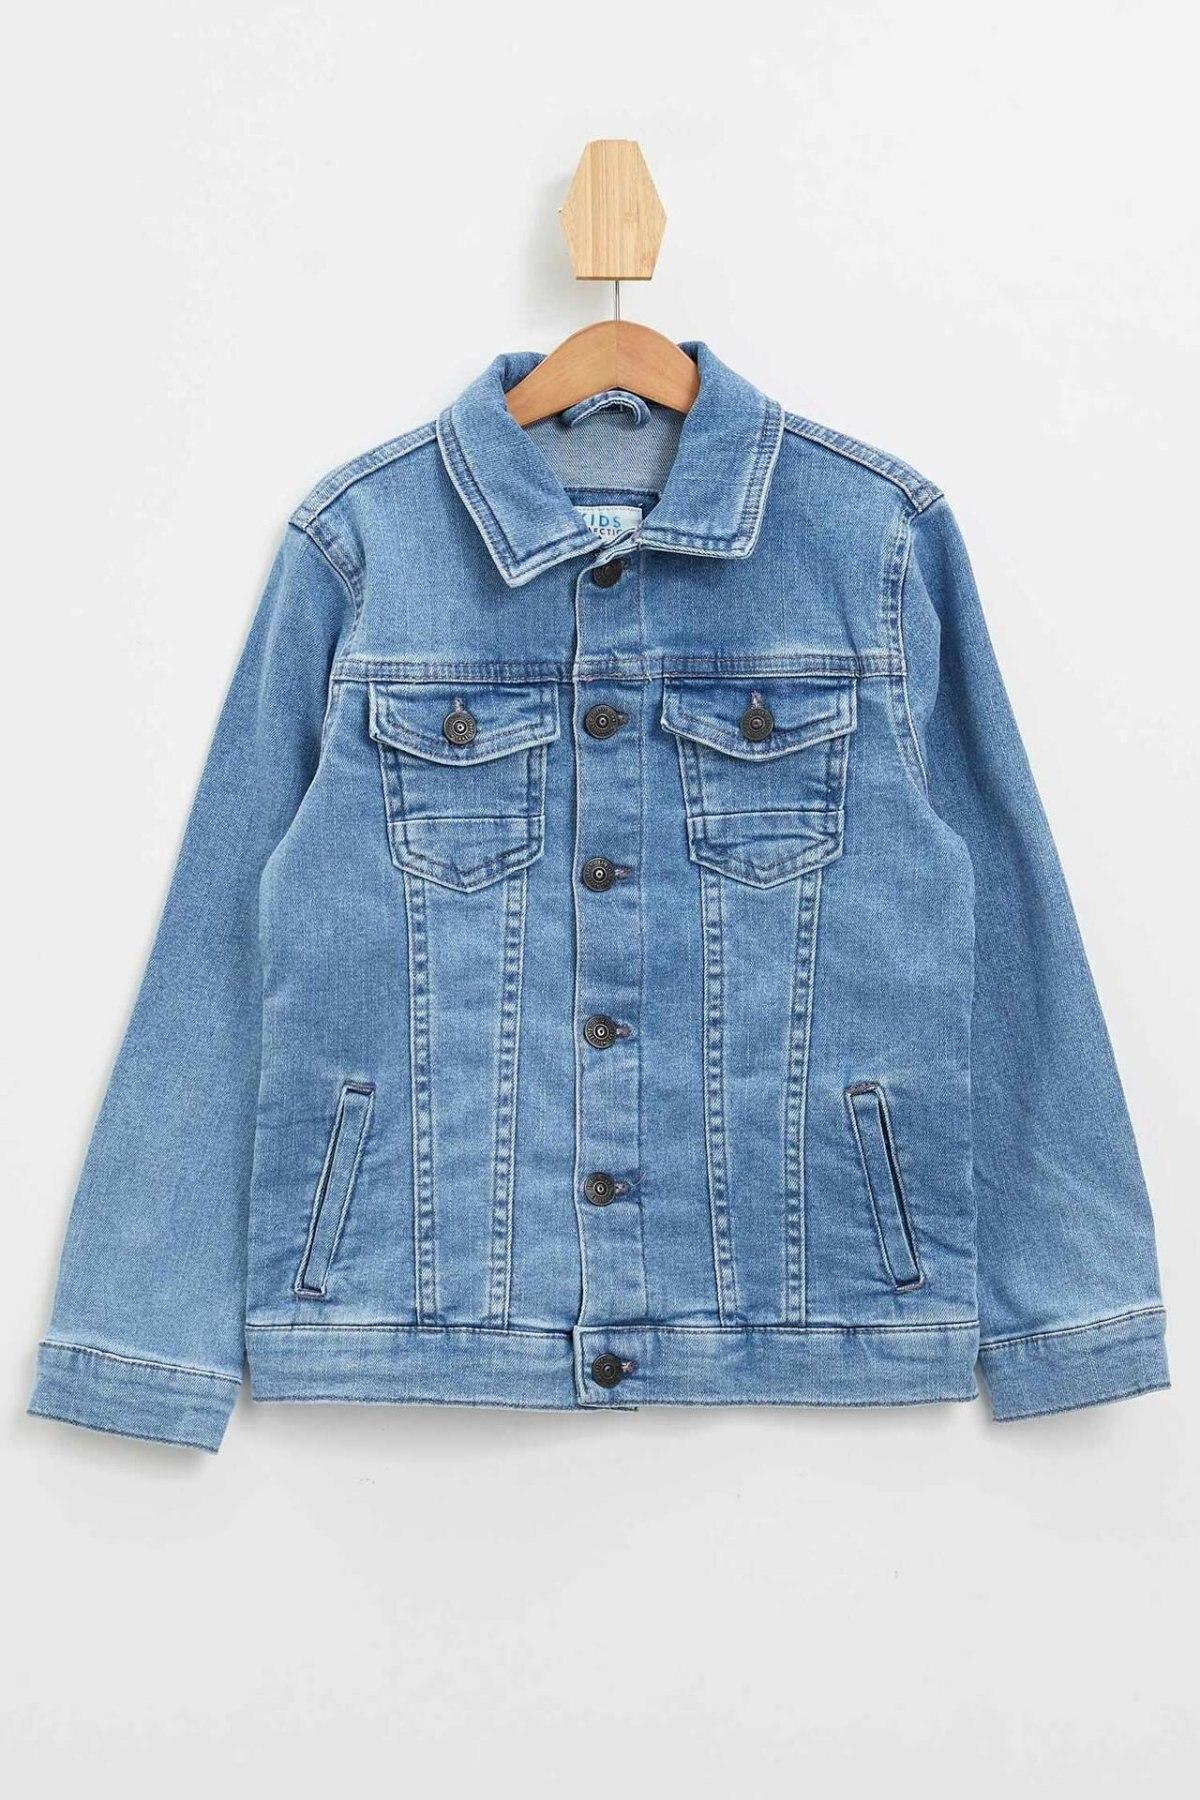 Chaqueta de mezclilla Casual de verano para niño de defact, chaqueta vaquera azul elegante para niño, abrigos de mezclilla a la moda para Jackets-M9846A620SM